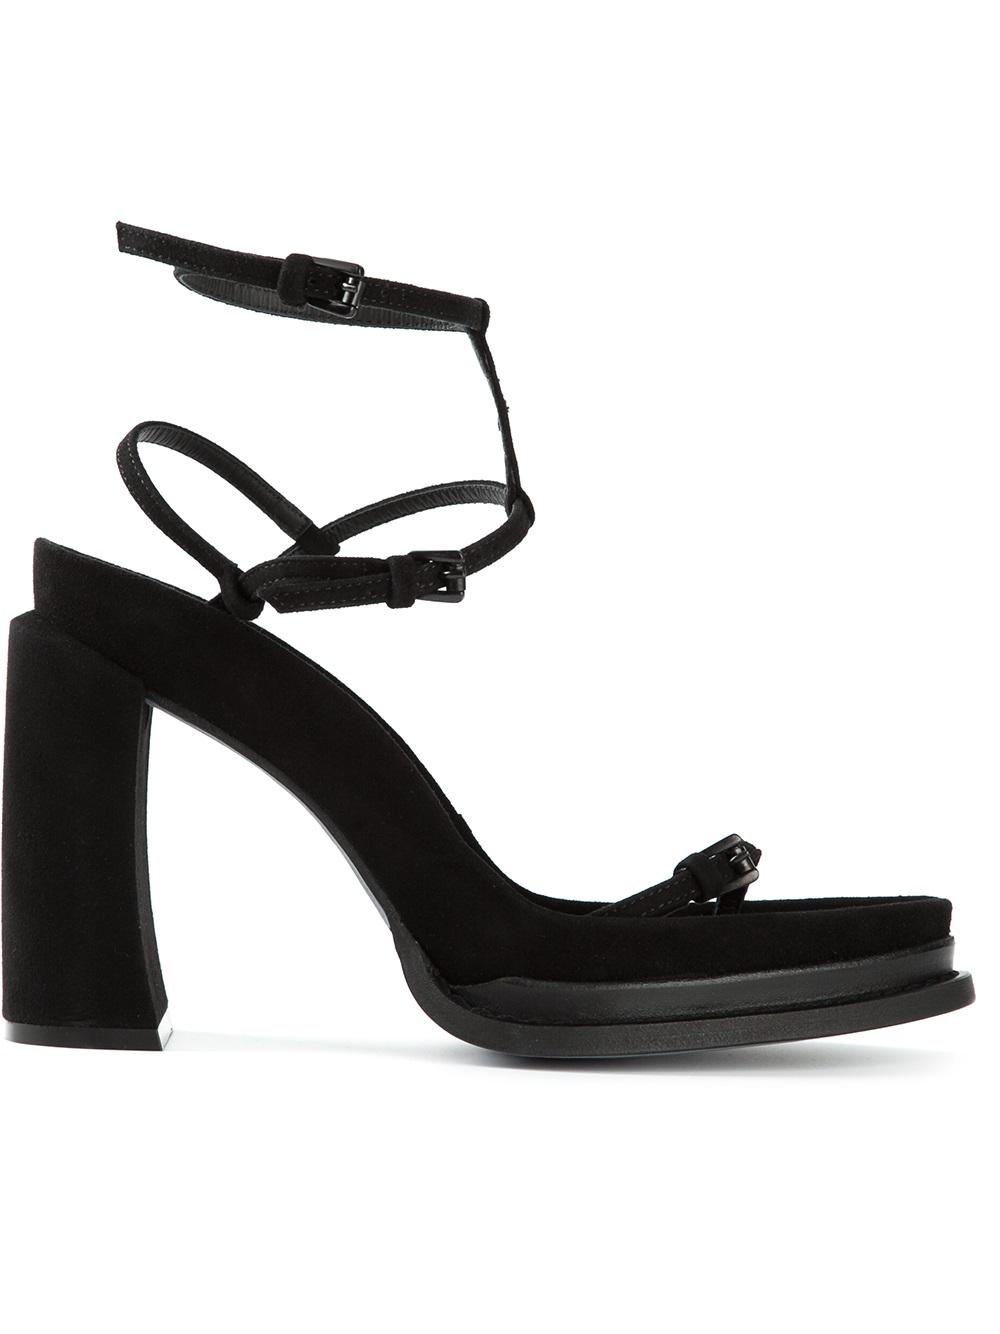 bcf48c2bf8dd Ann Demeulemeester Chunky Heel Sandals in Black - Lyst